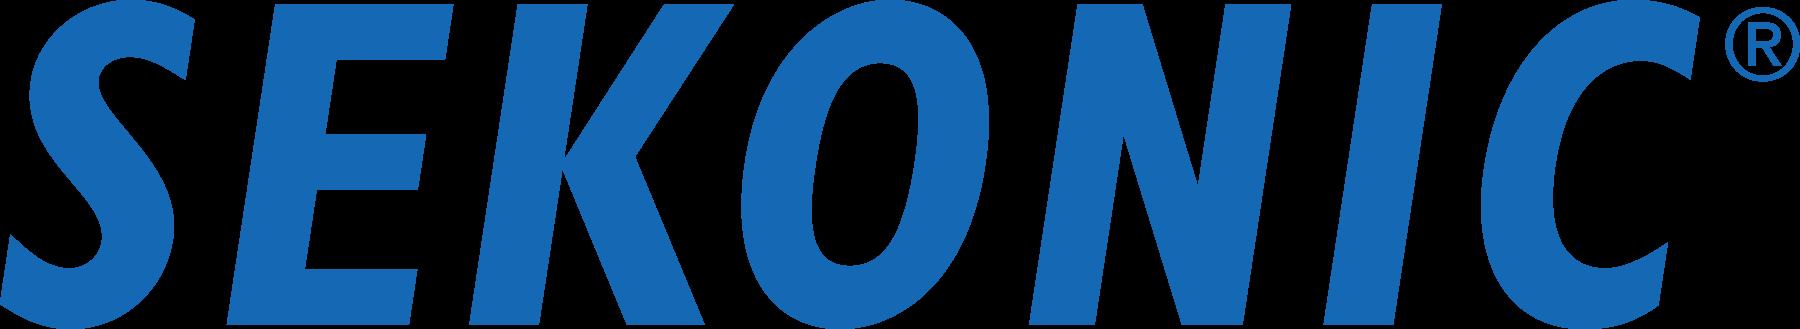 Sekonic-LOGO.png